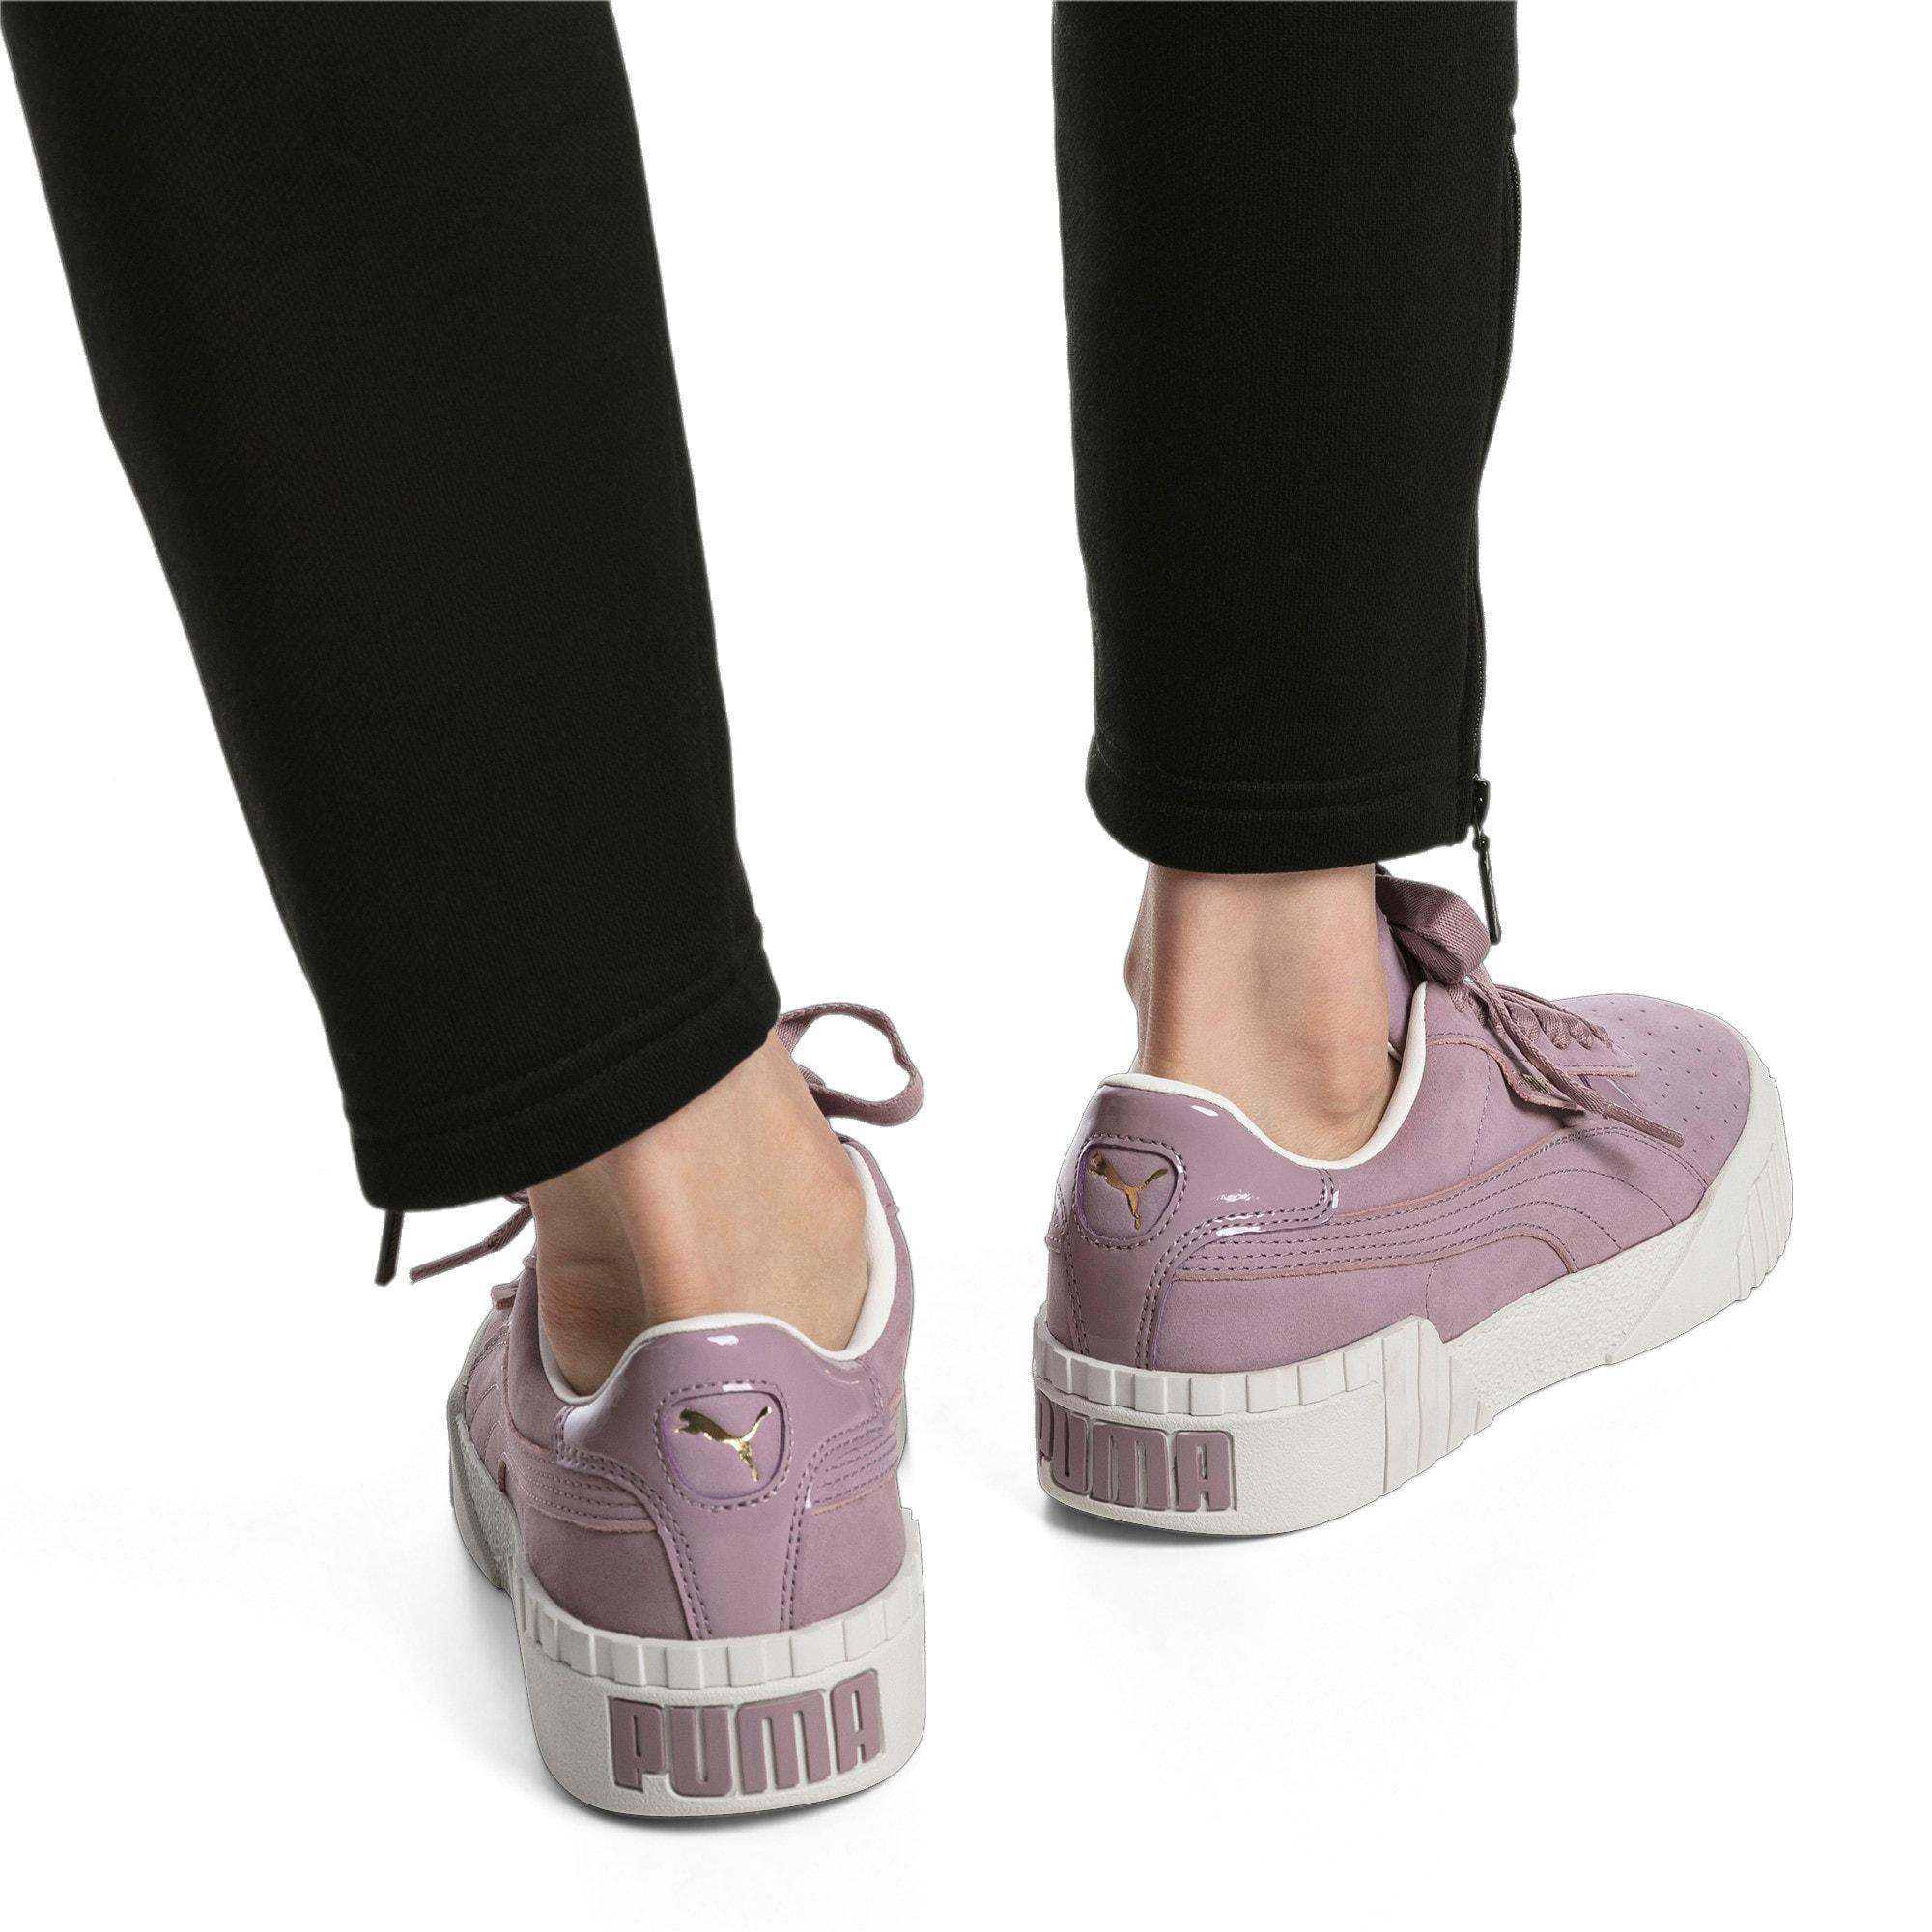 Thumbnail 2 of Cali Nubuck Women's Sneakers, Elderberry, medium